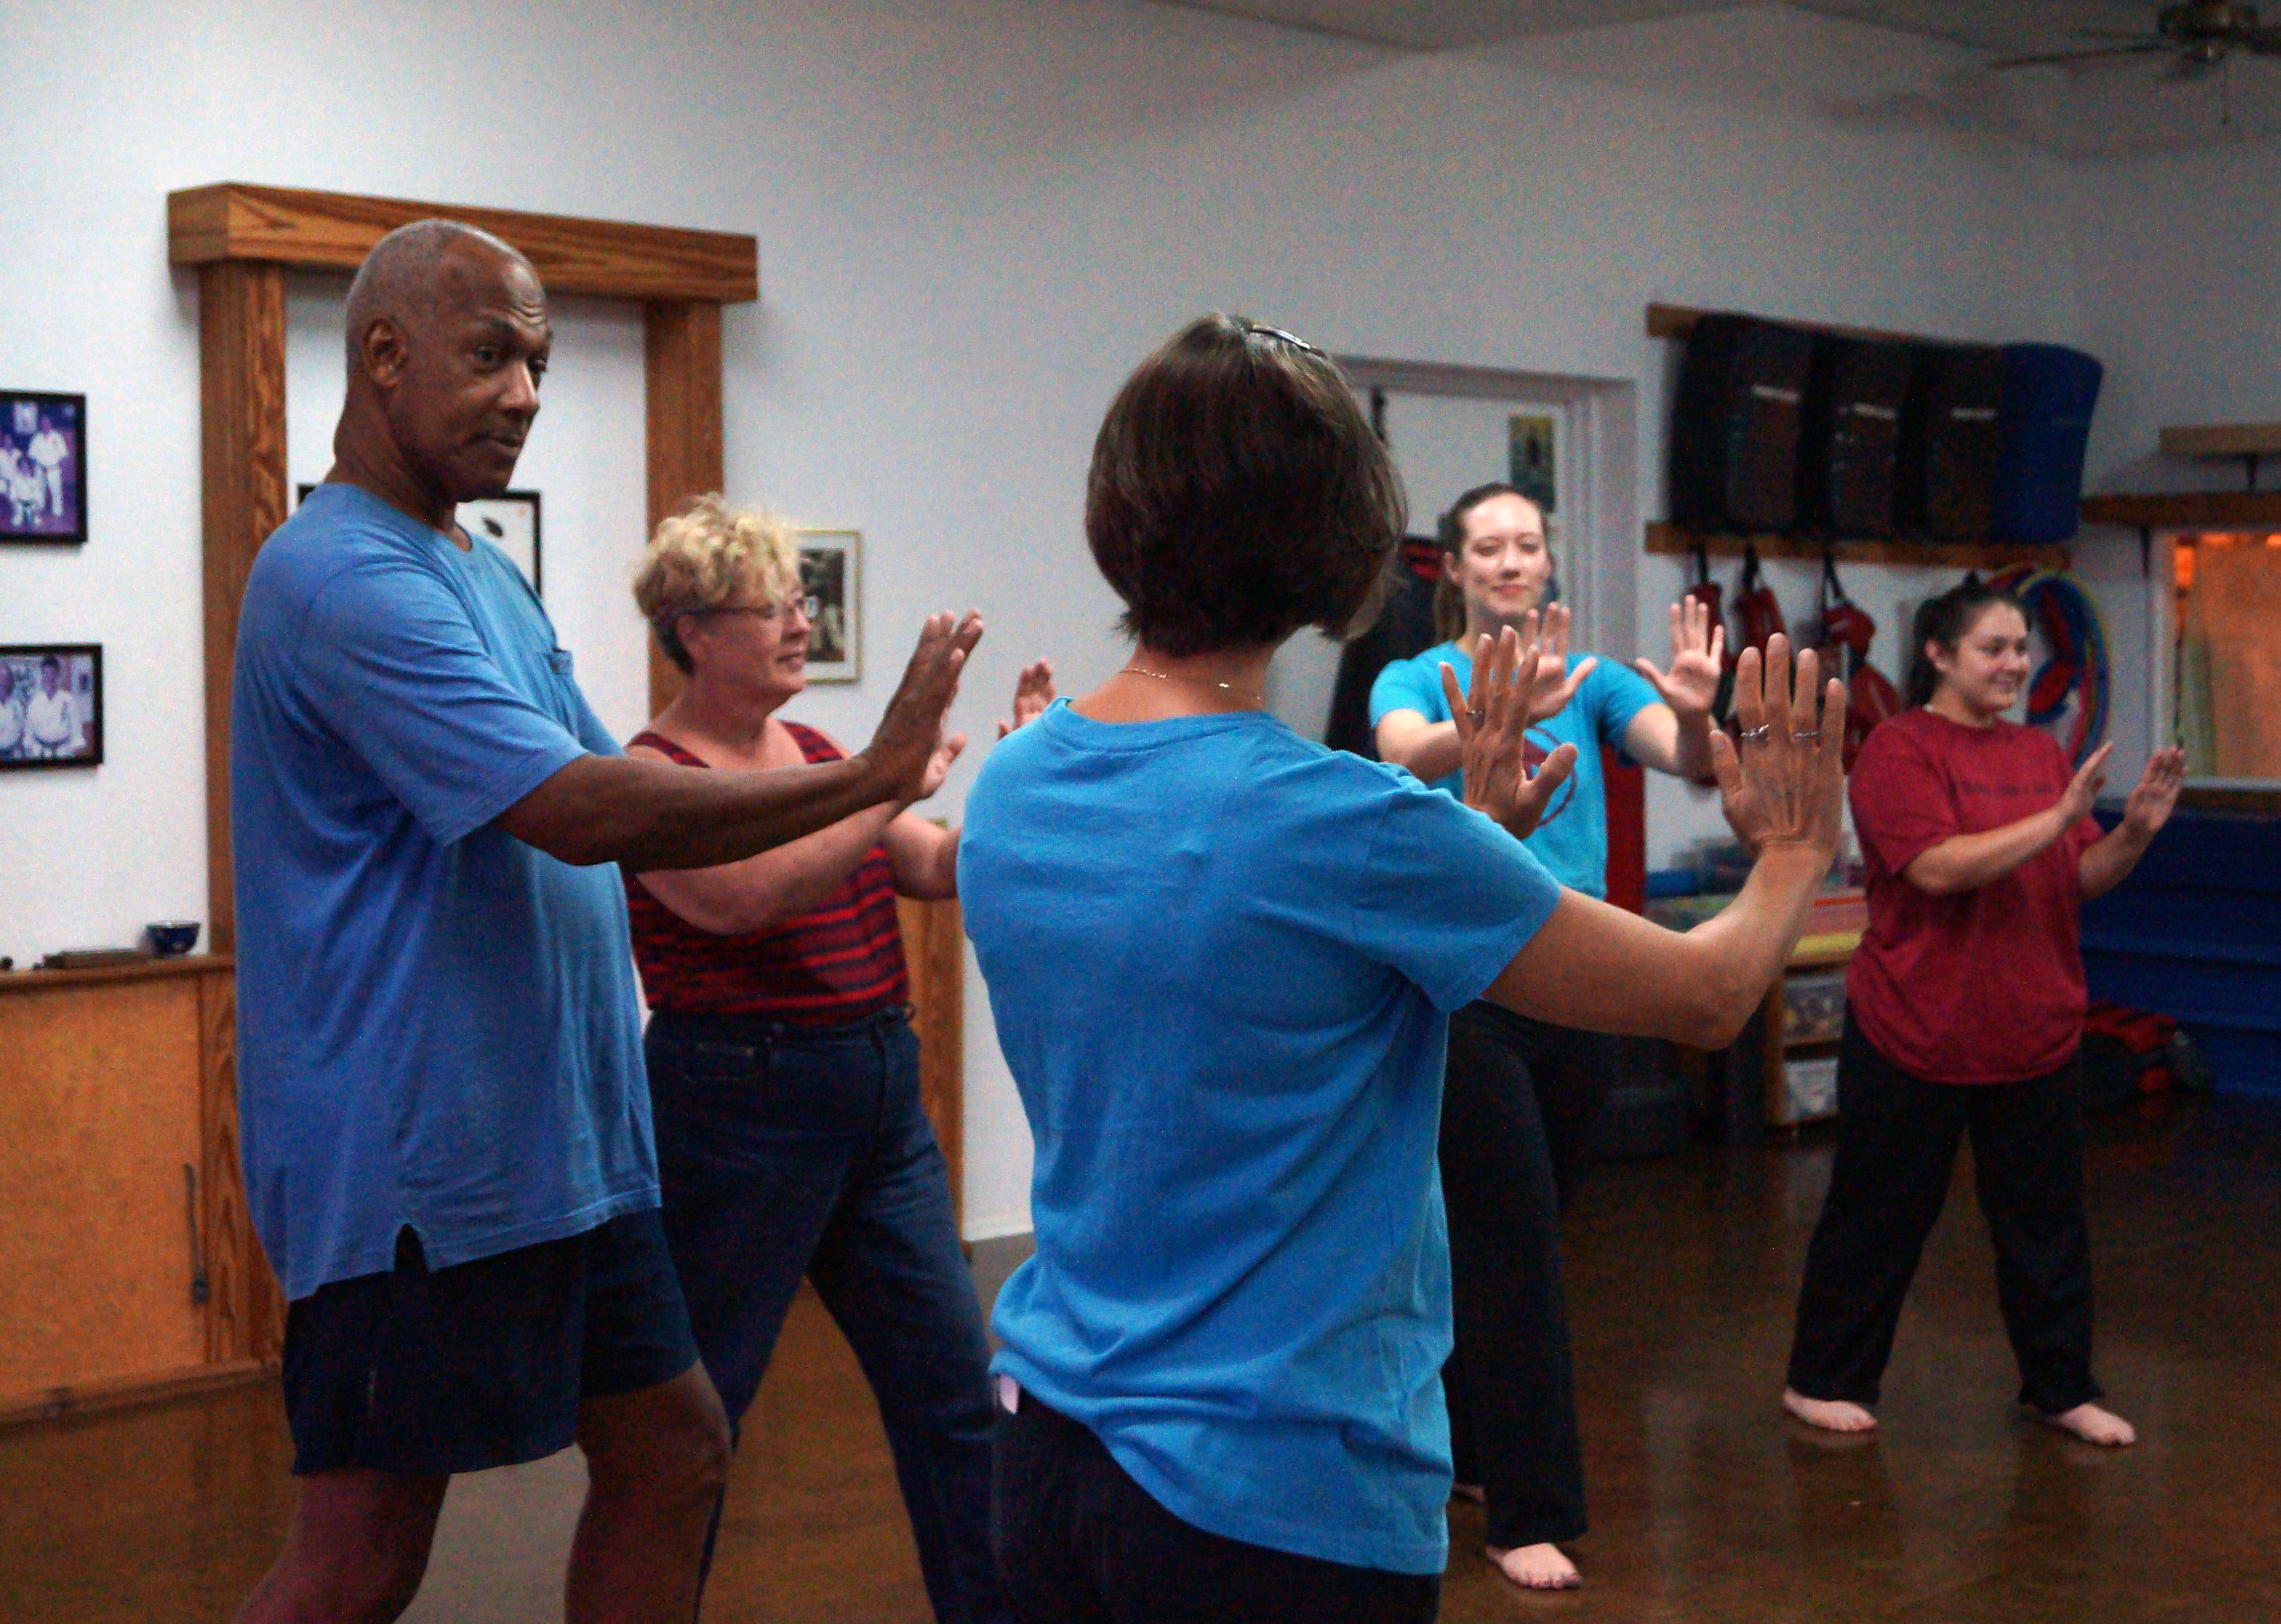 Self defense: GROUP